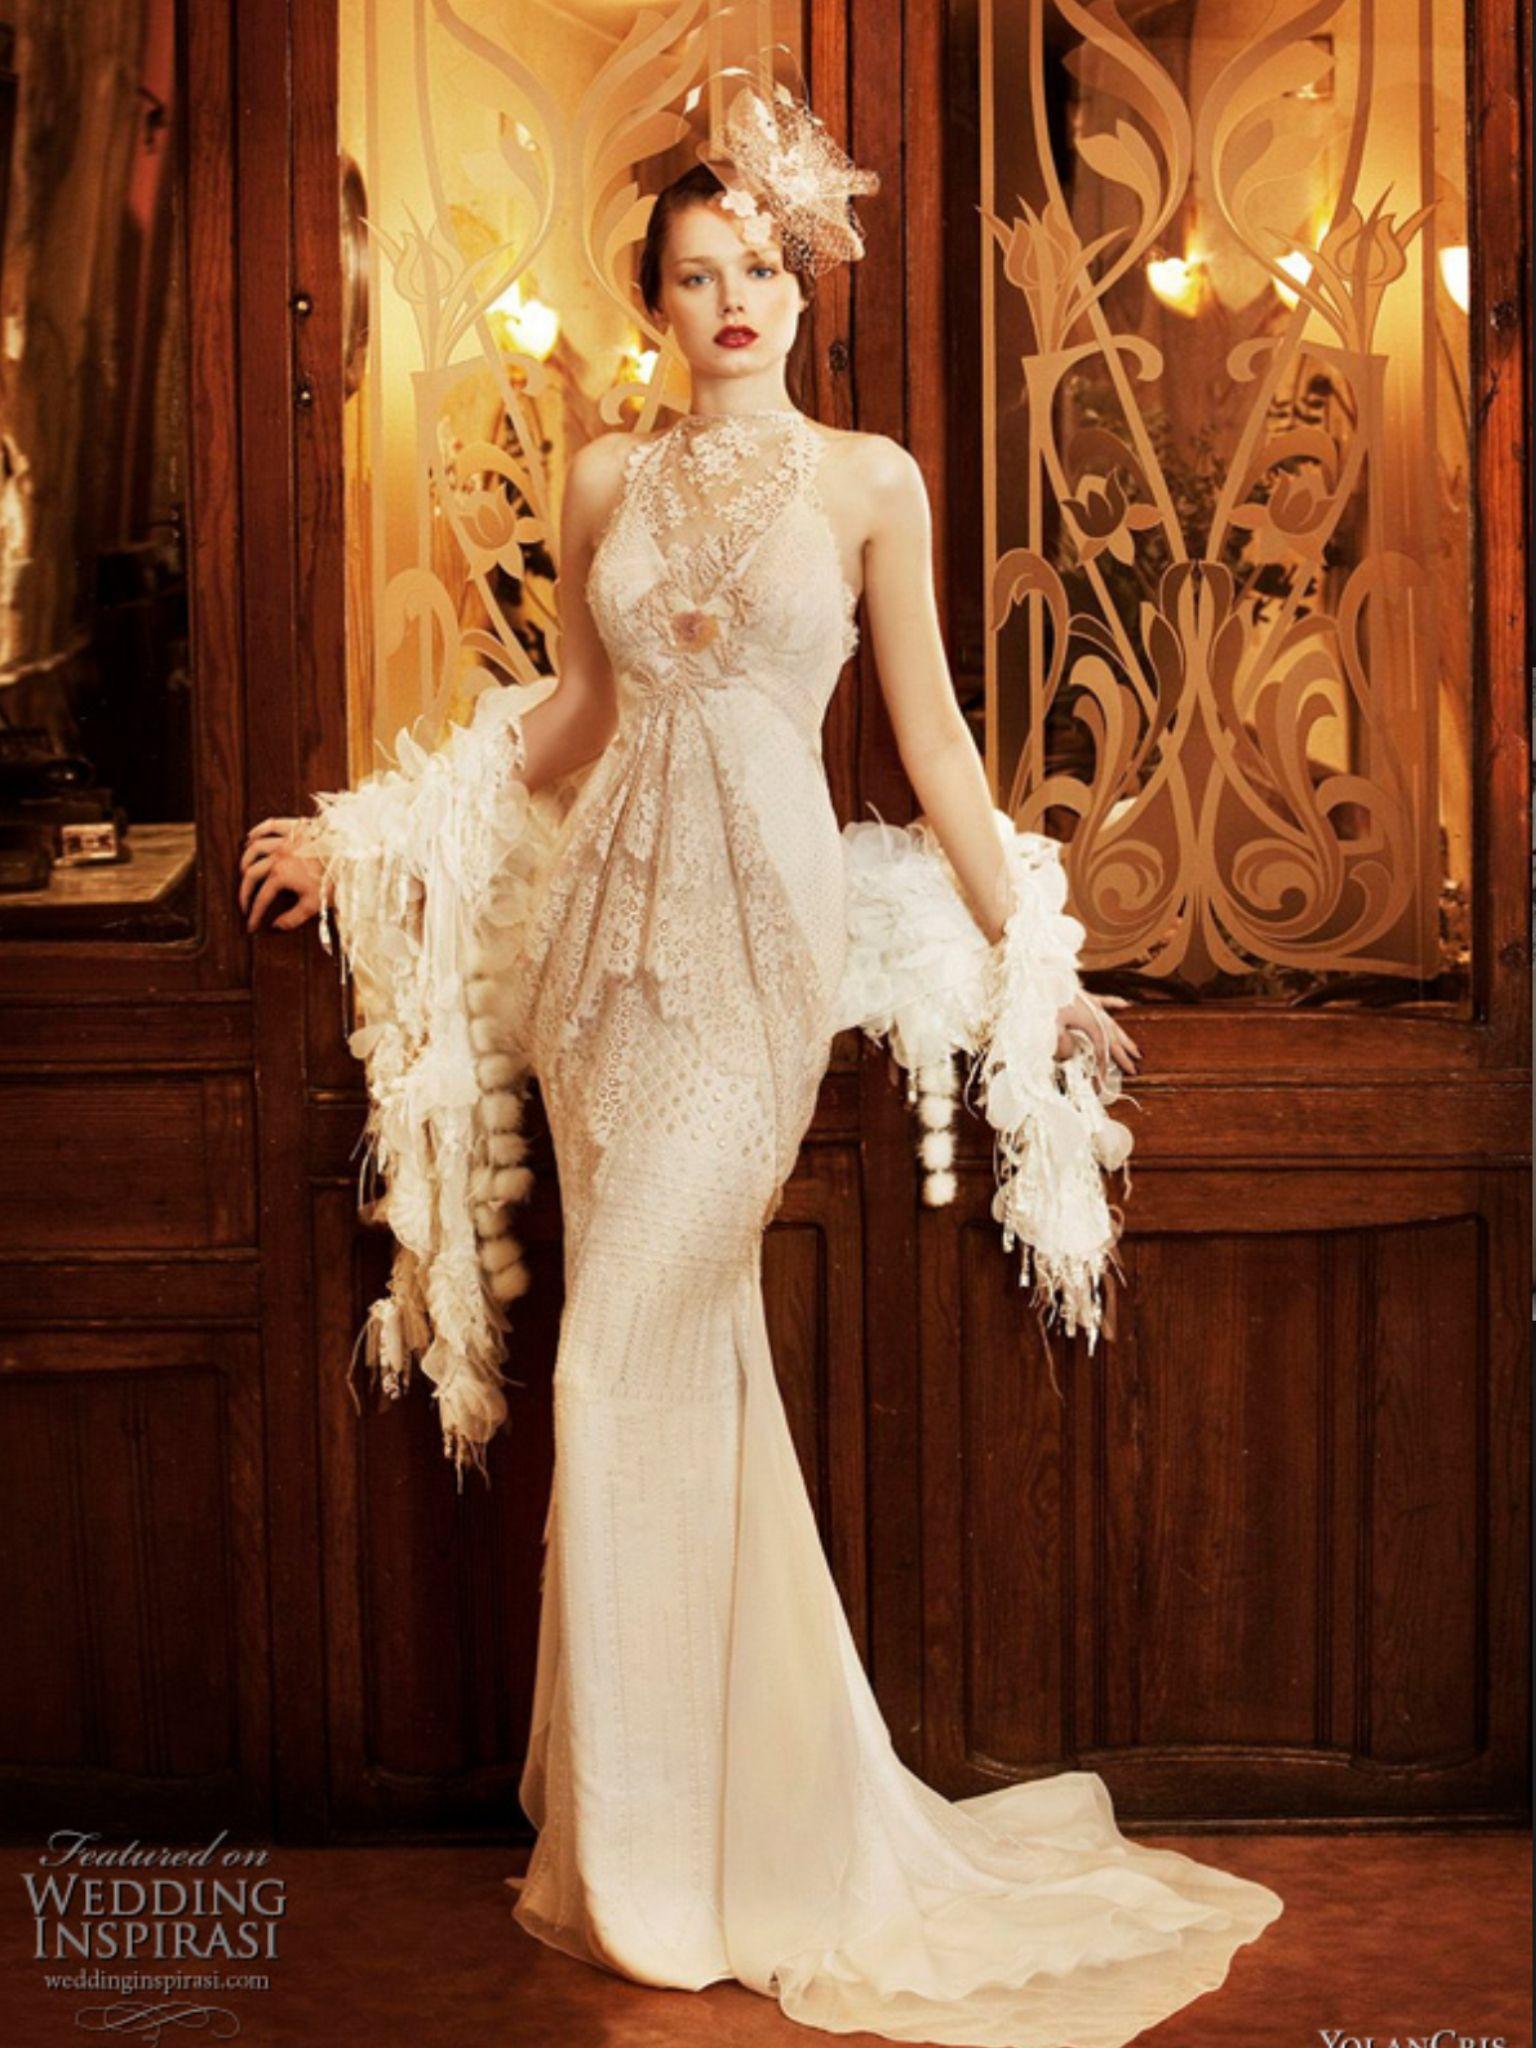 1920s style wedding dress gatsby wedding glam pinterest 1920s style wedding dress ombrellifo Gallery